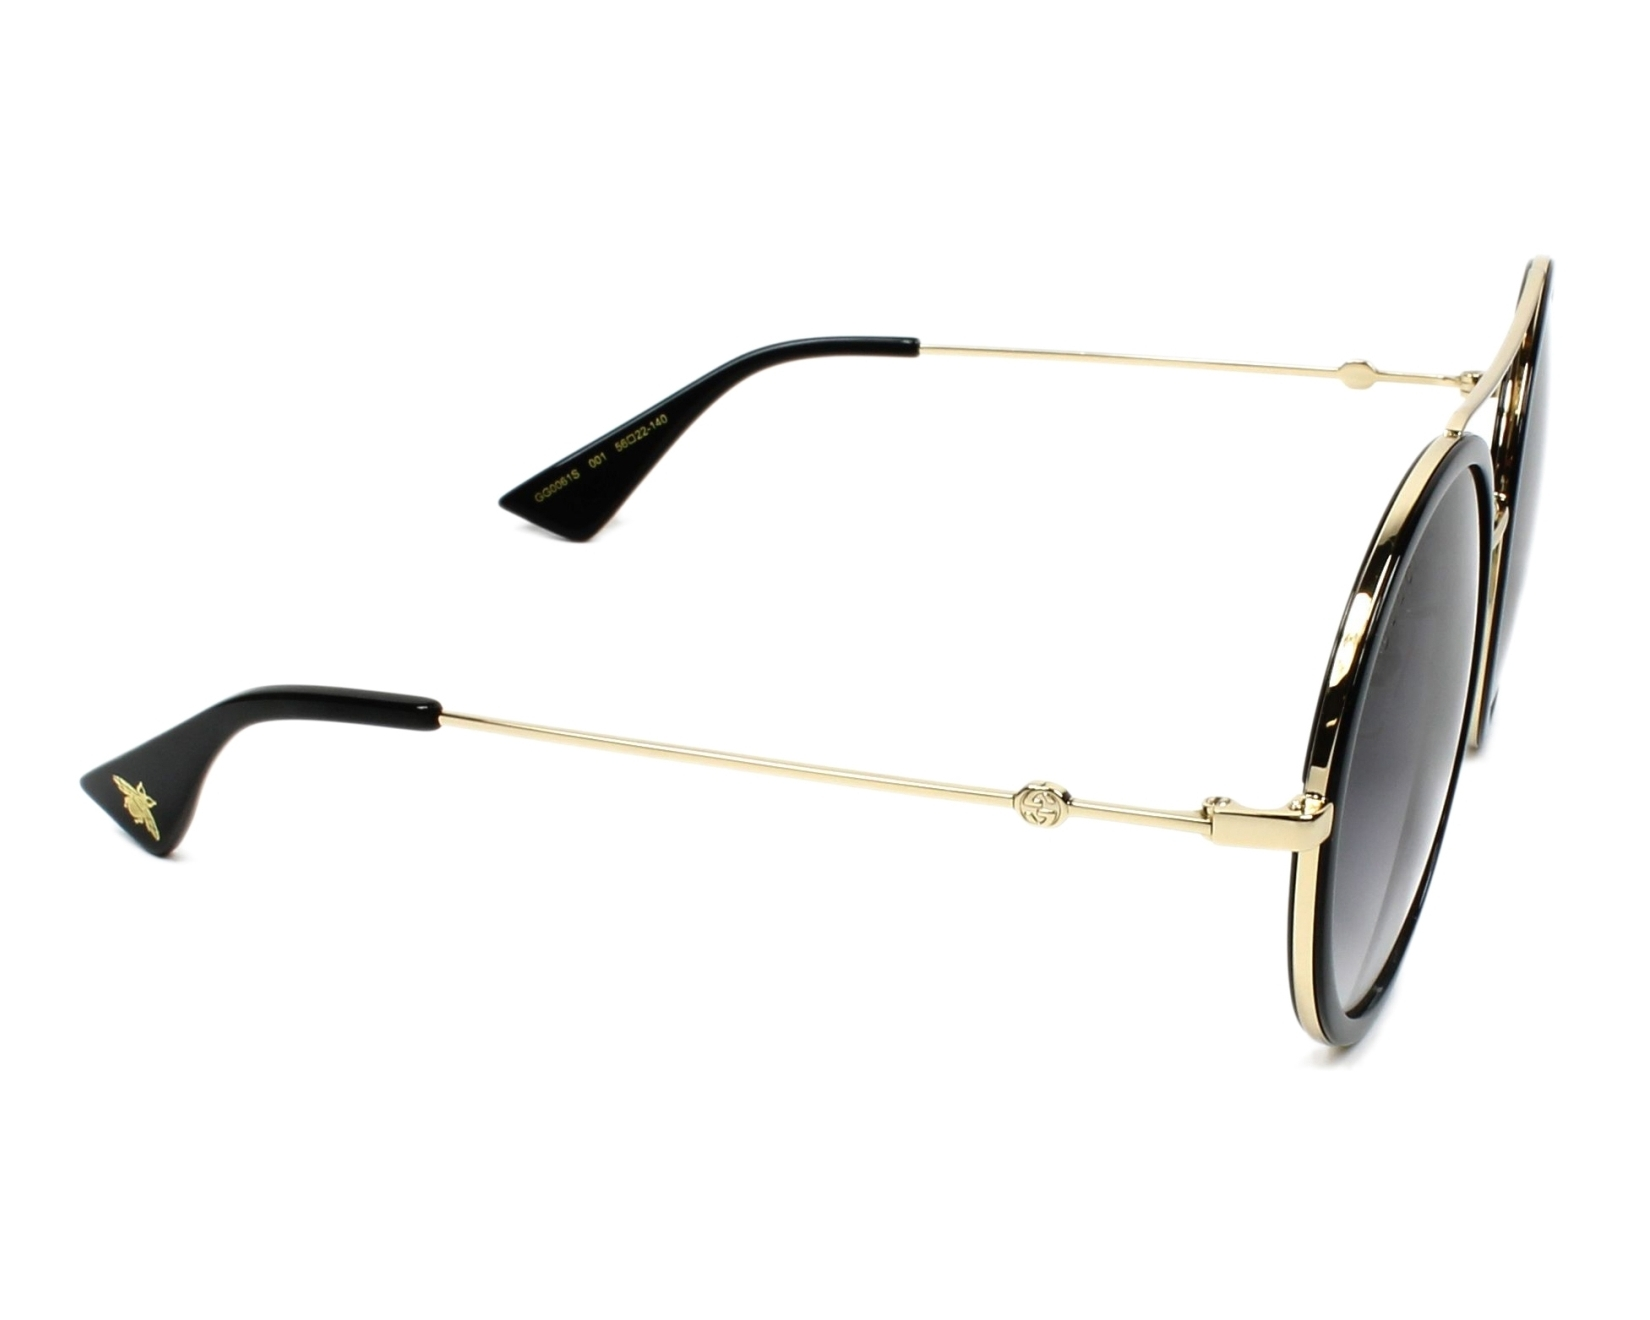 5759939d31 Sunglasses Gucci GG-0061-S 001 56-22 Black Gold side view